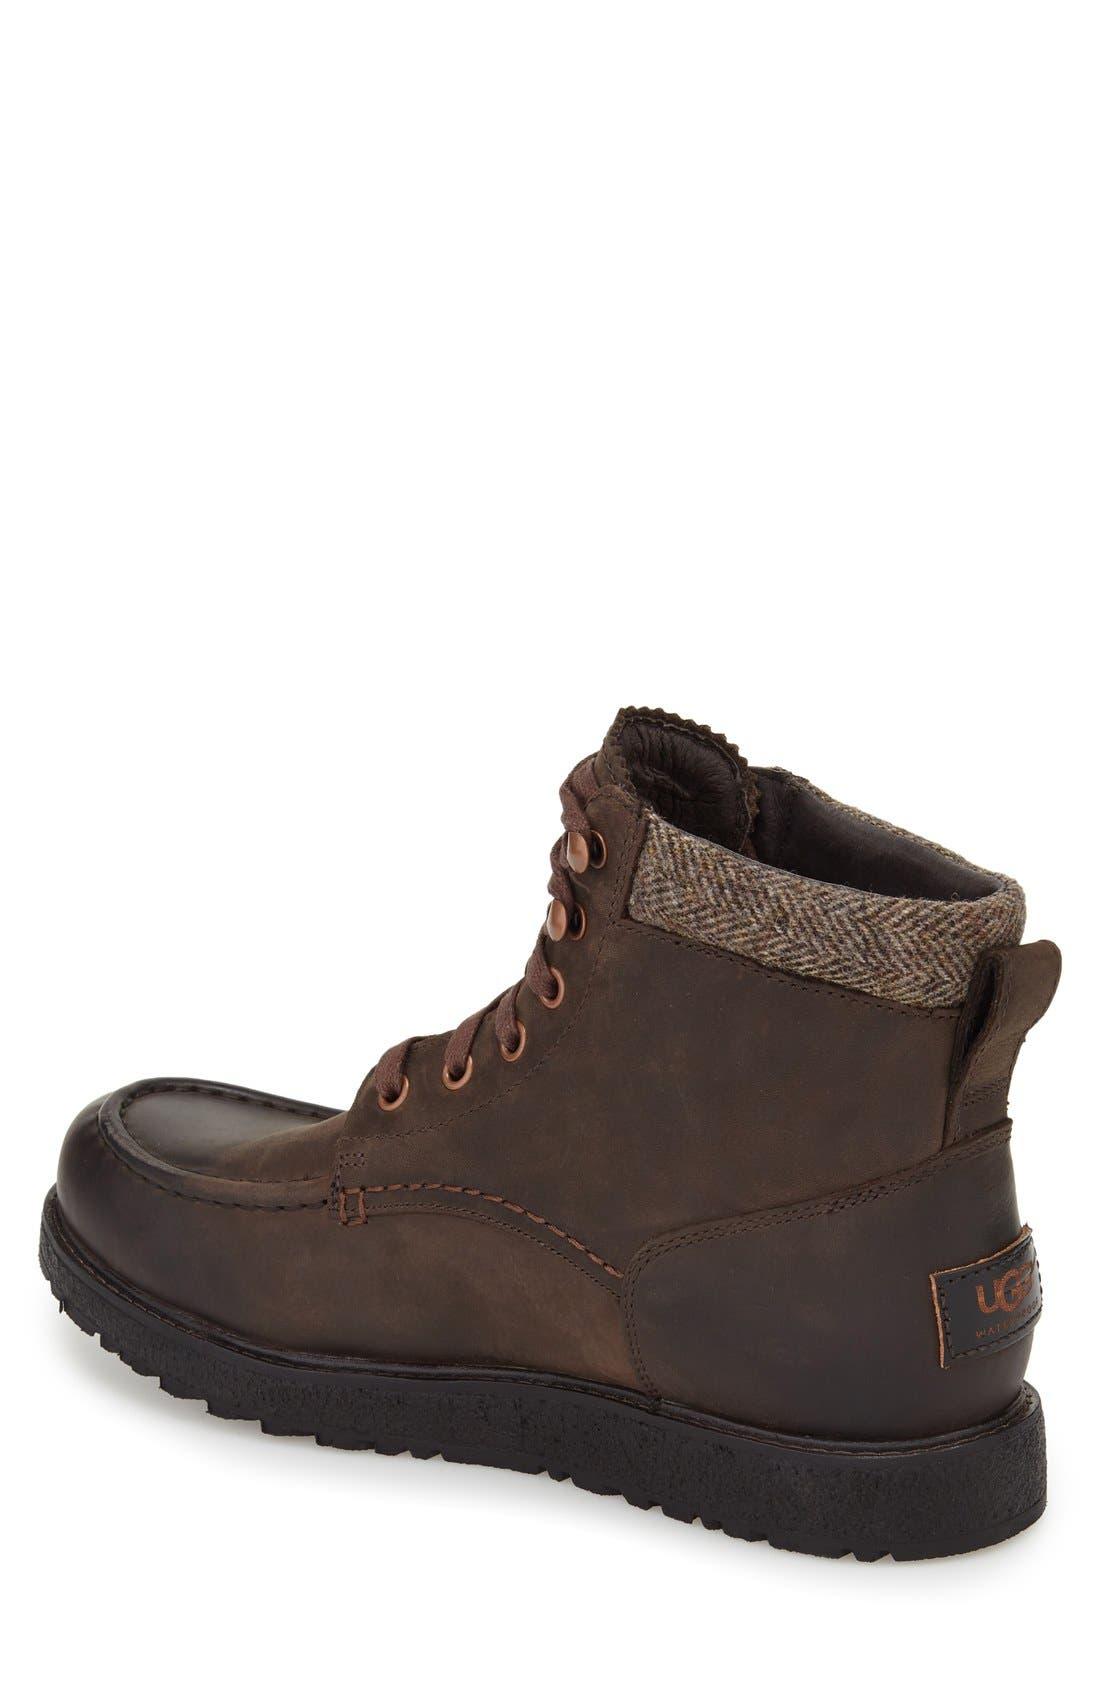 Alternate Image 2  - UGG® Merrick Moc Toe Boot (Men)